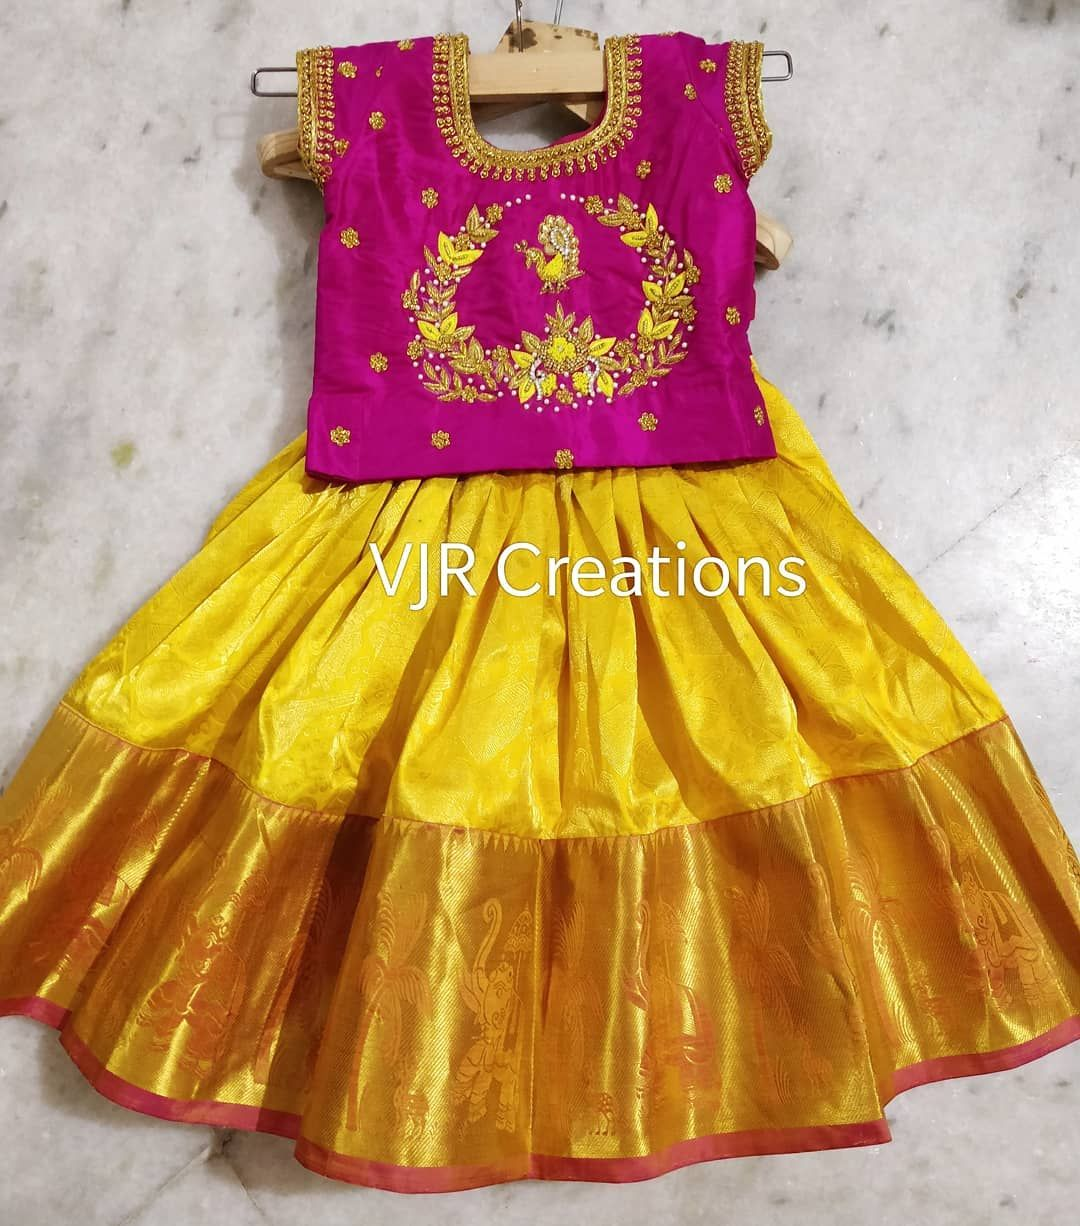 Kanchipattu Langa Blouse For Kids Pink And Yellow Combo Maggam Work Indian Wear To O Kids Blouse Designs Kids Frocks Design Kids Designer Dresses